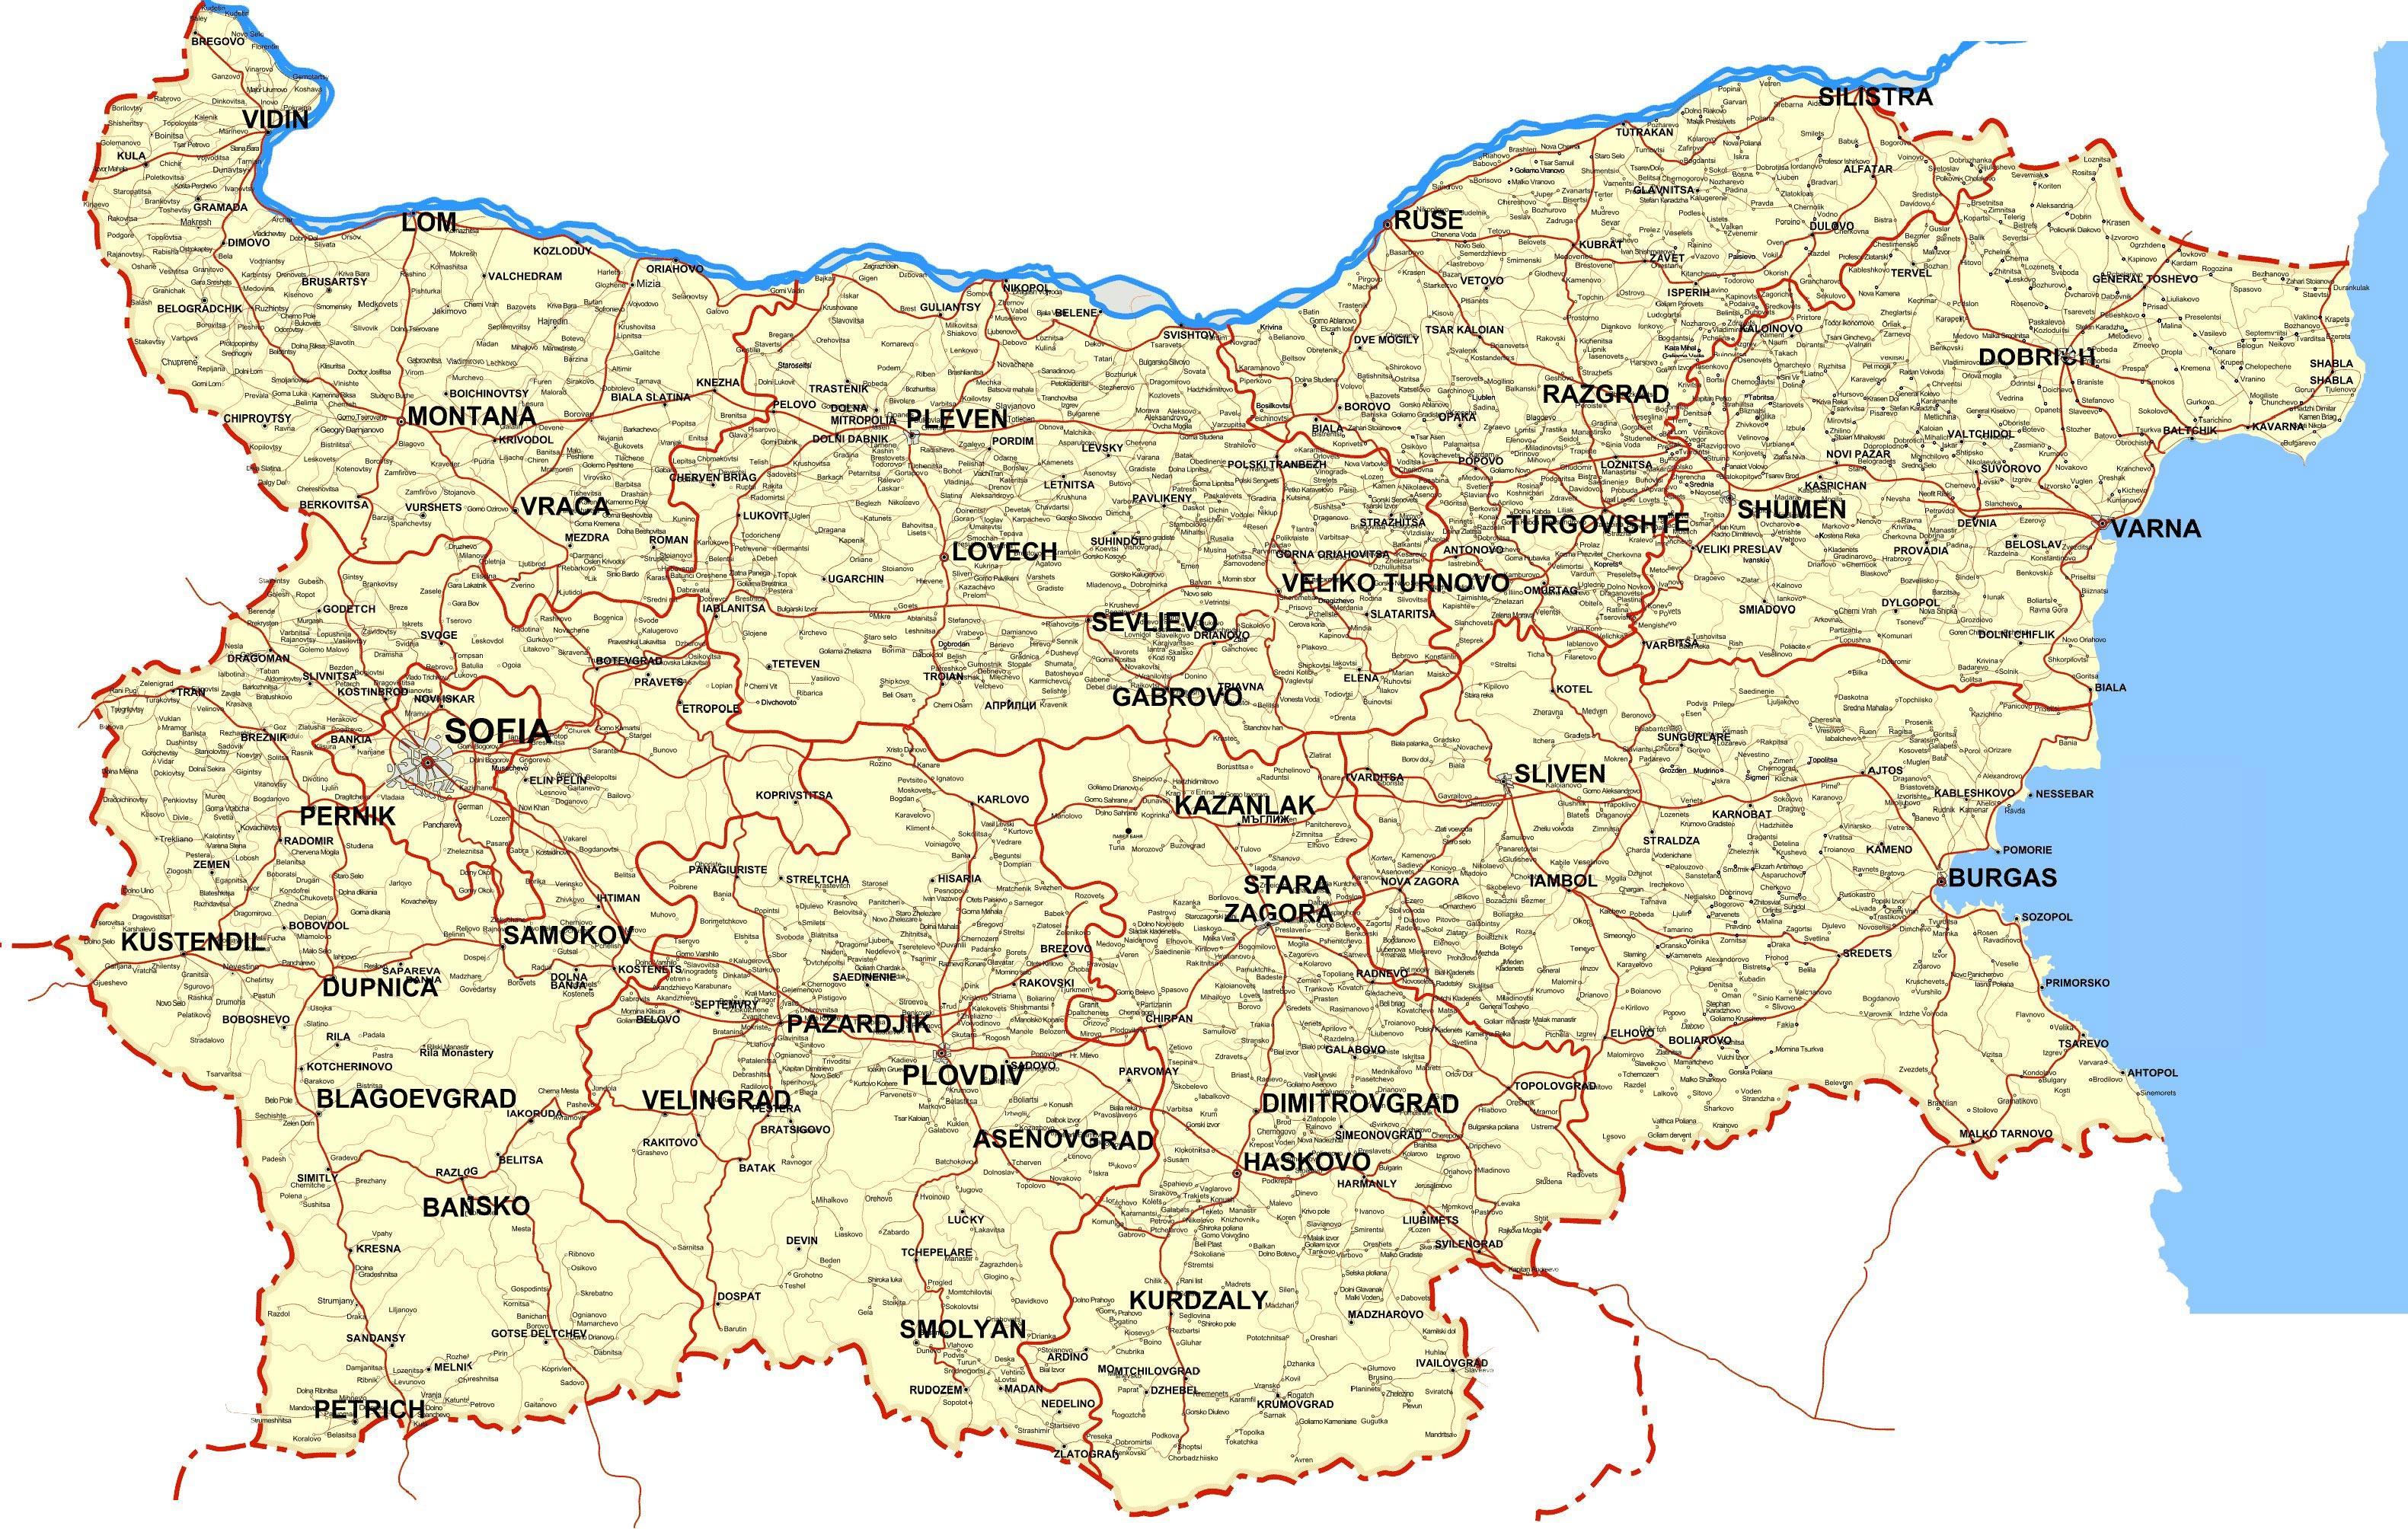 Kort Over Bulgarien Bulgarien Land Kort Ostlige Europa Europa